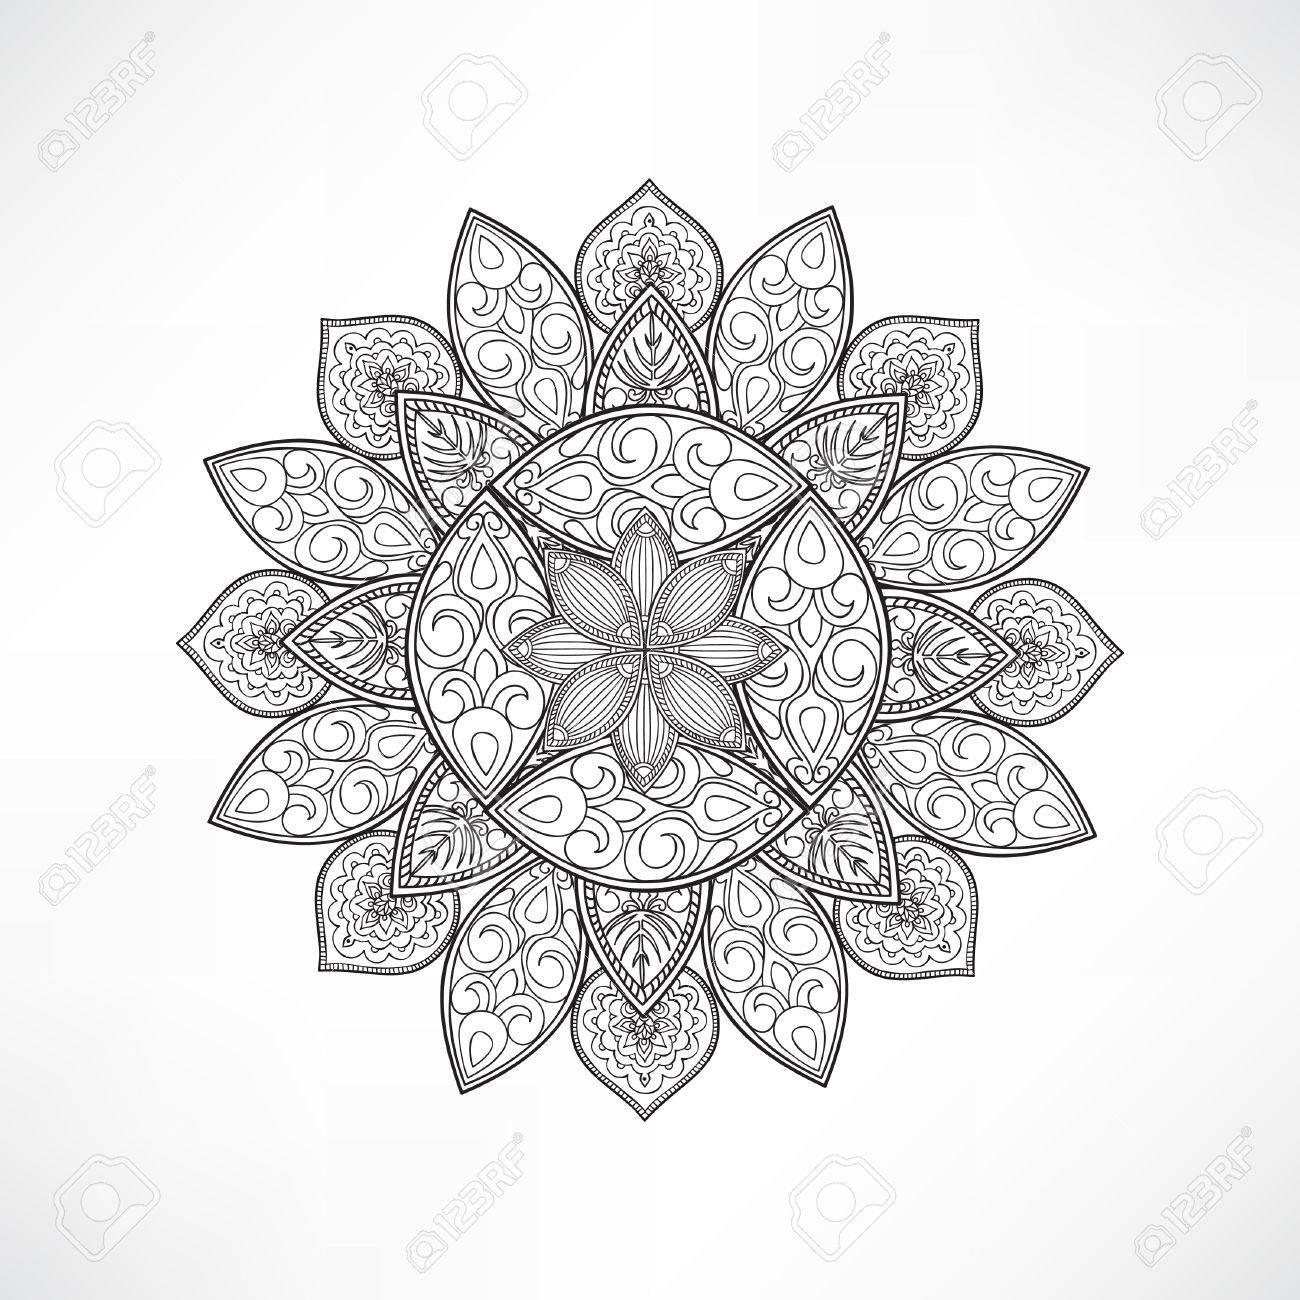 Mandala De La Flor Geométrica Para Colorear. Colorear Mandala Vector ...